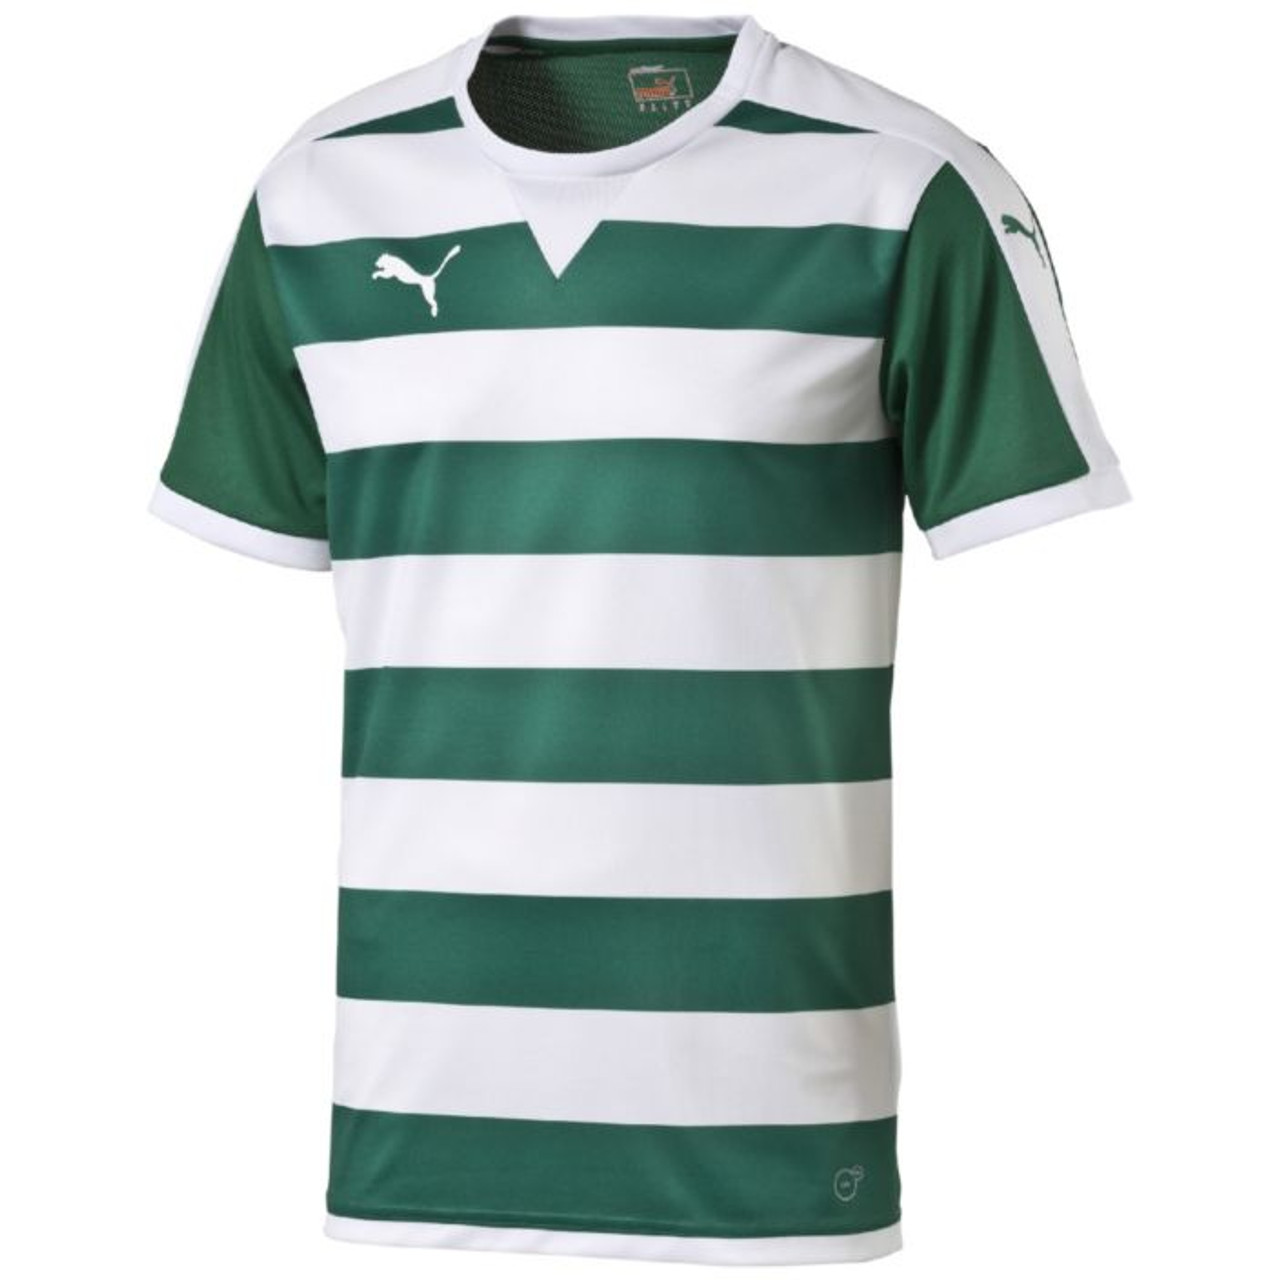 Puma Pulse Soccer Jersey at dtisports.com 9f98aa99a